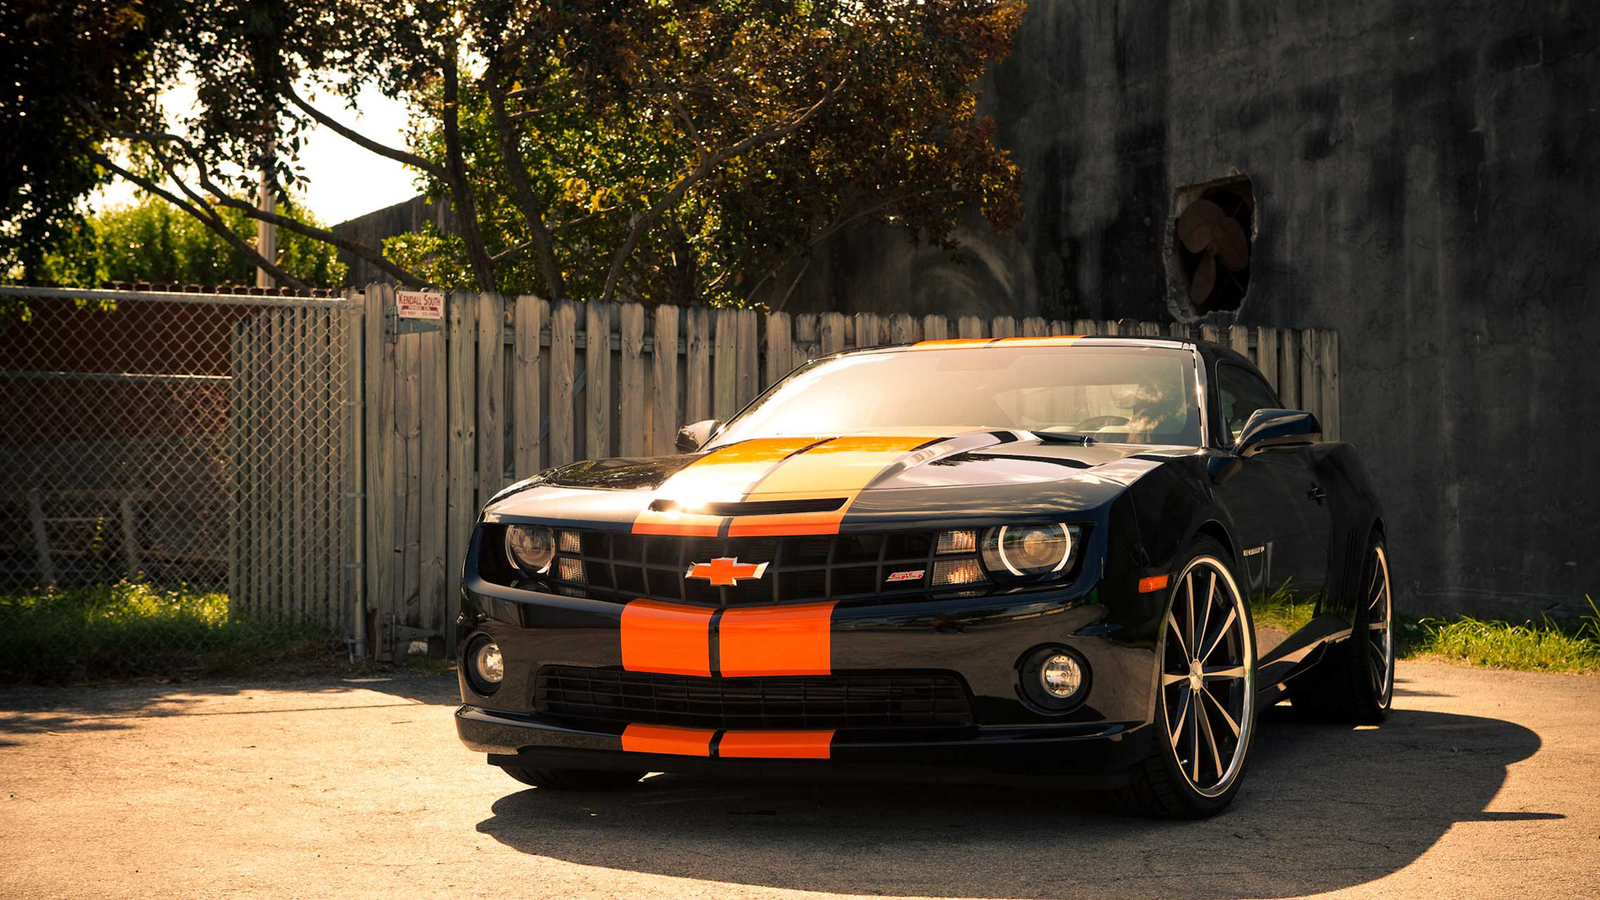 Chevrolet camaro обои 1600х900 картинки фото на